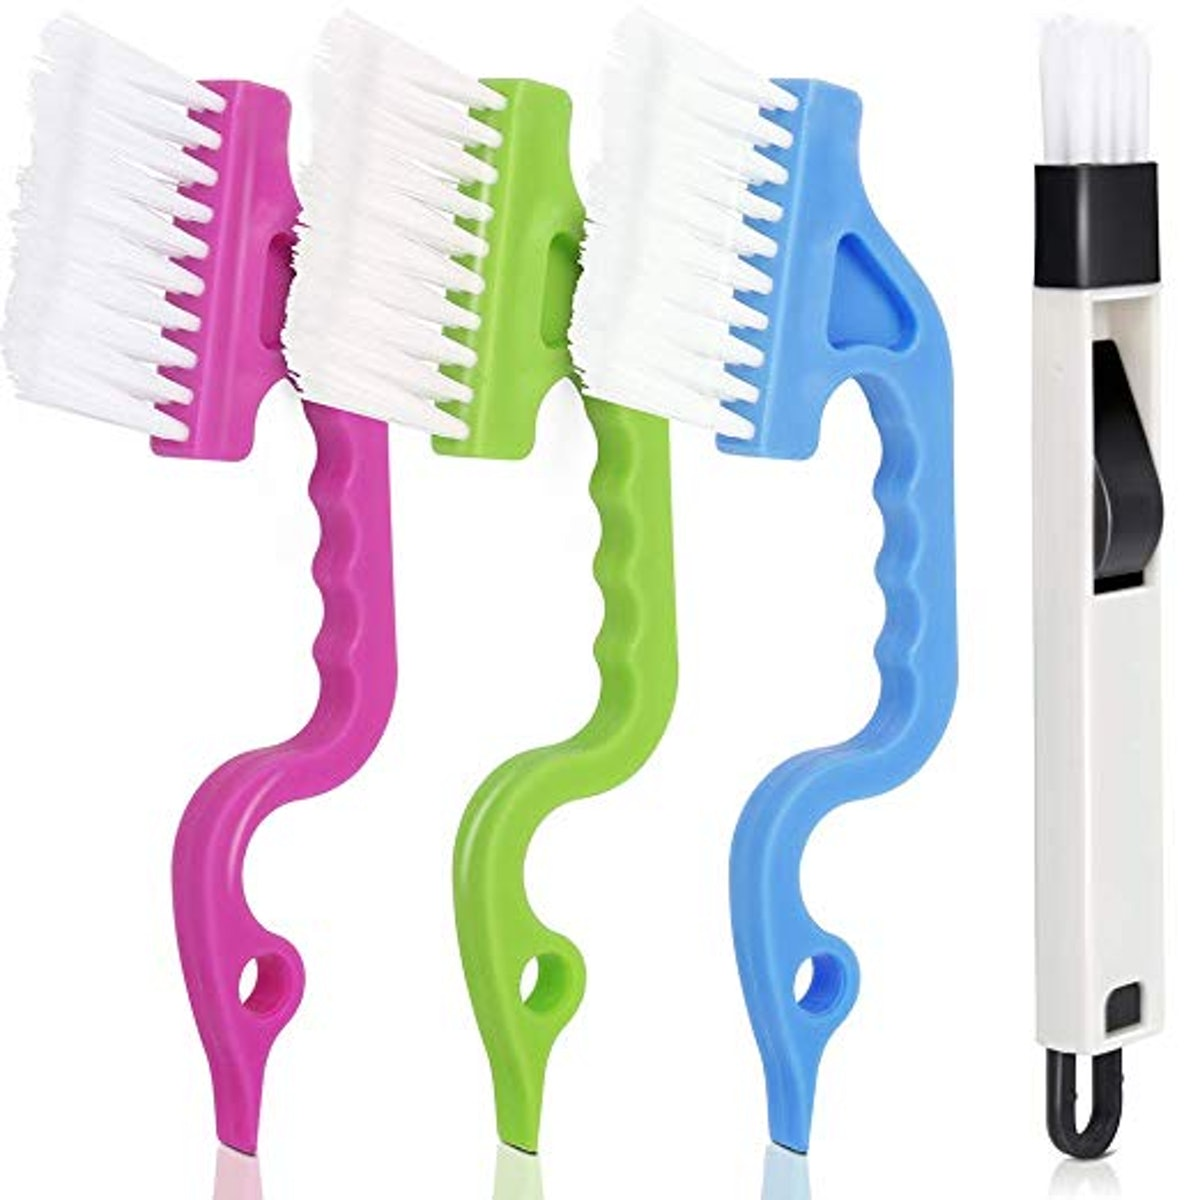 Leobro Handheld Cleaning Tools (Set of 4)